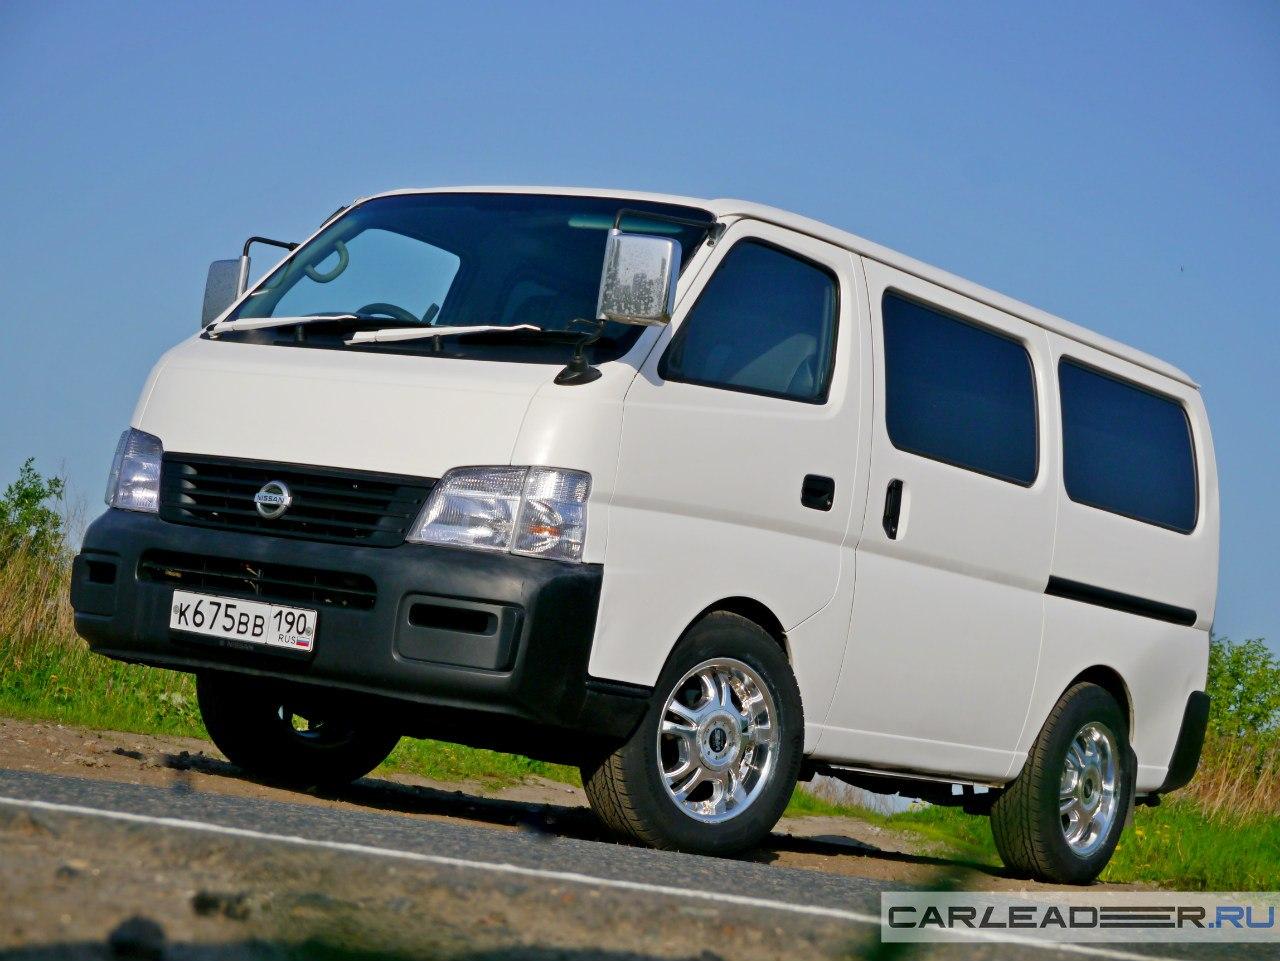 Nissan Caravan Continental tyres chrome wheels manaray car leader